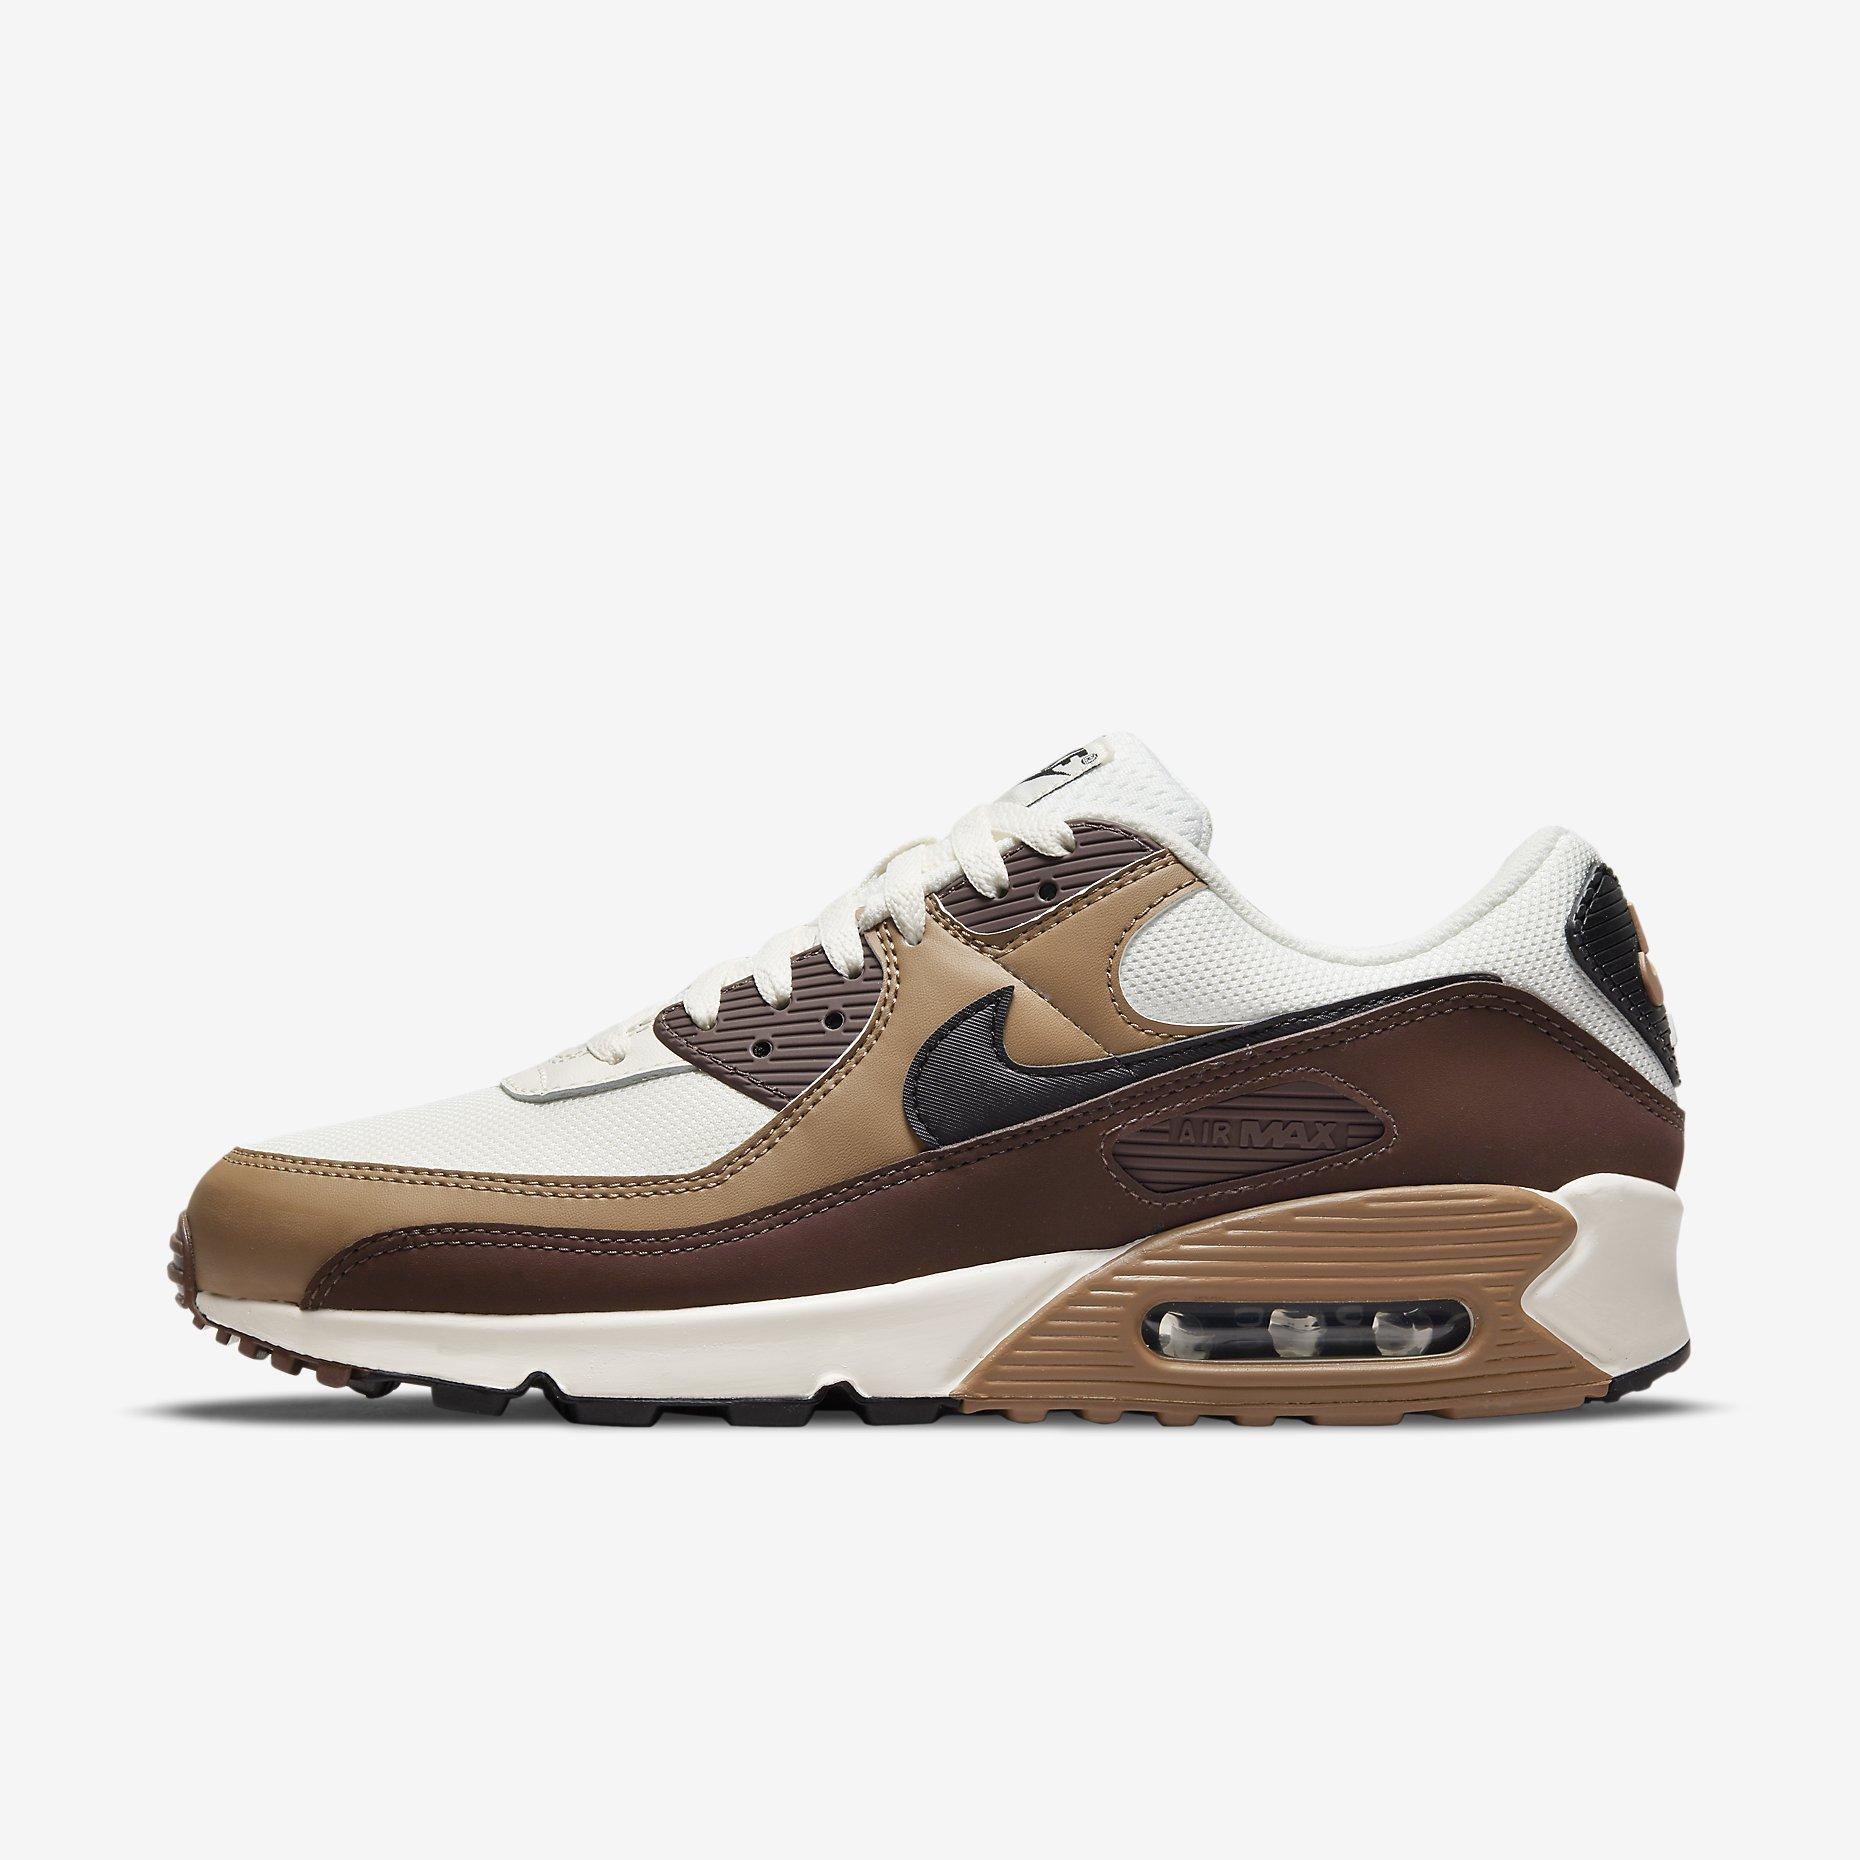 Nike Air Max 90 'Dark Driftwood/Light Chocolate'